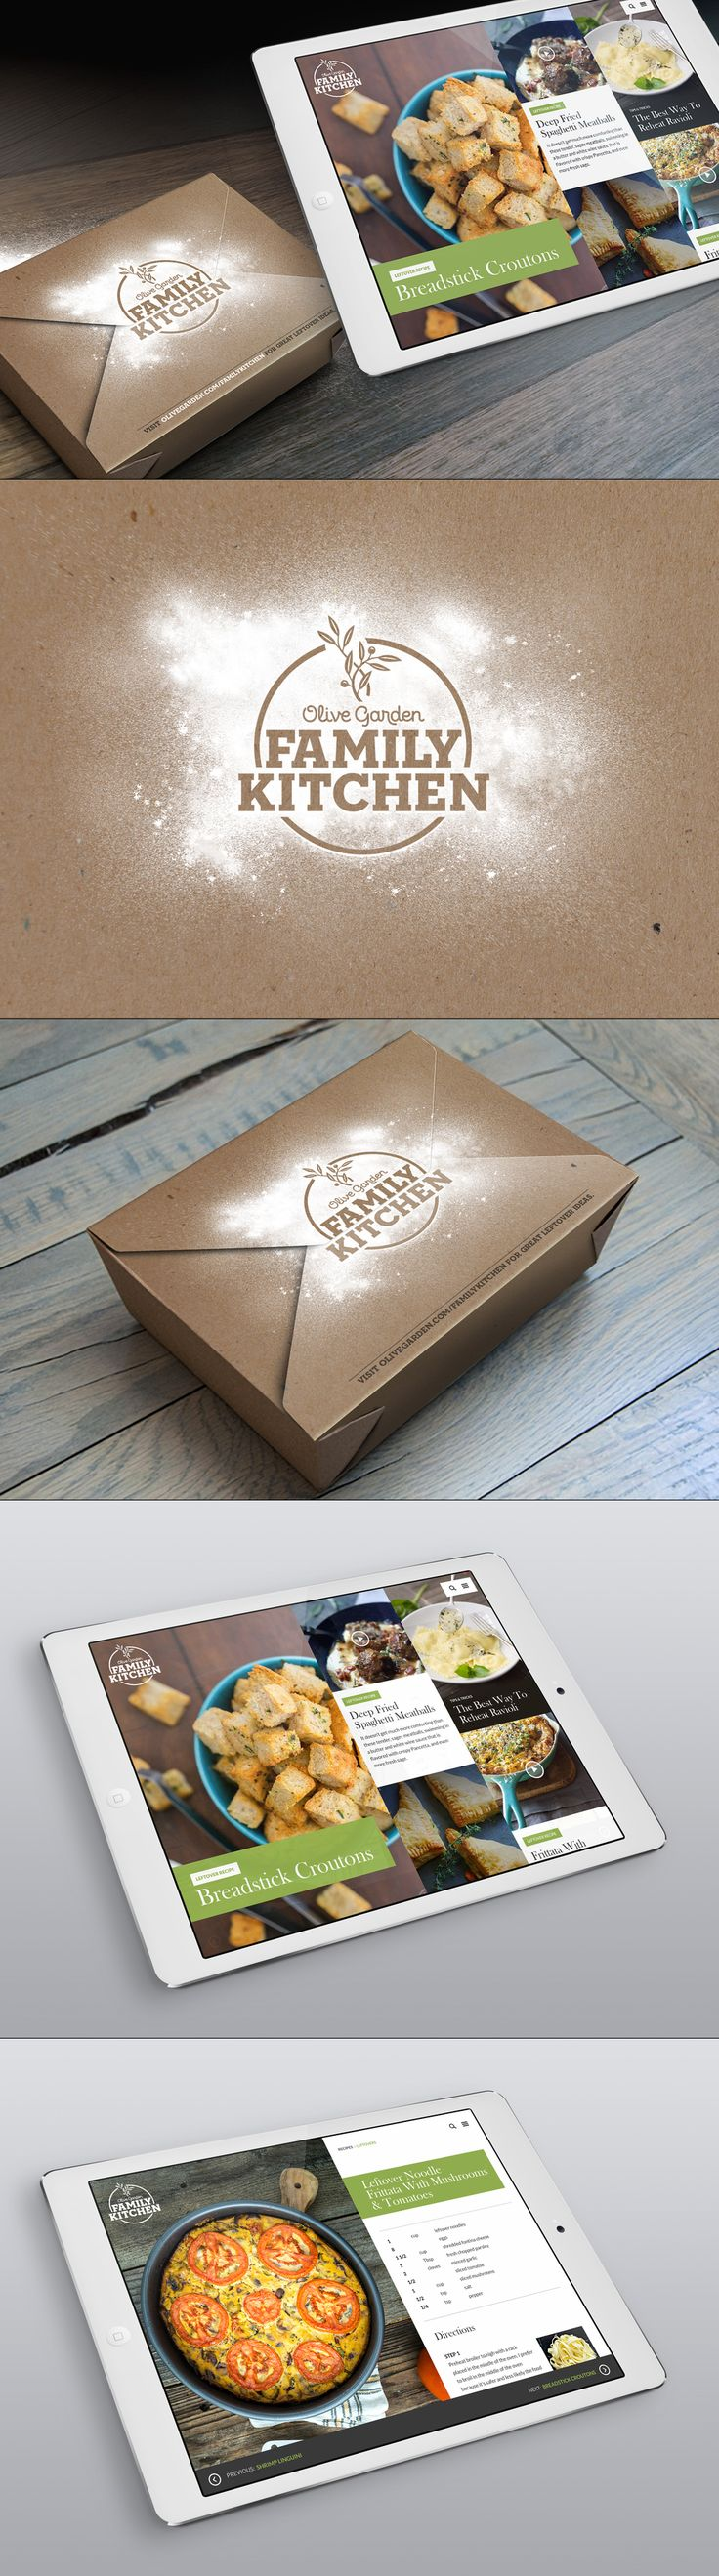 DBROWNIFIED  Olive Garden Box & App Design Concept: Print Design, Logo Design, App Design, Photoshop, Typography